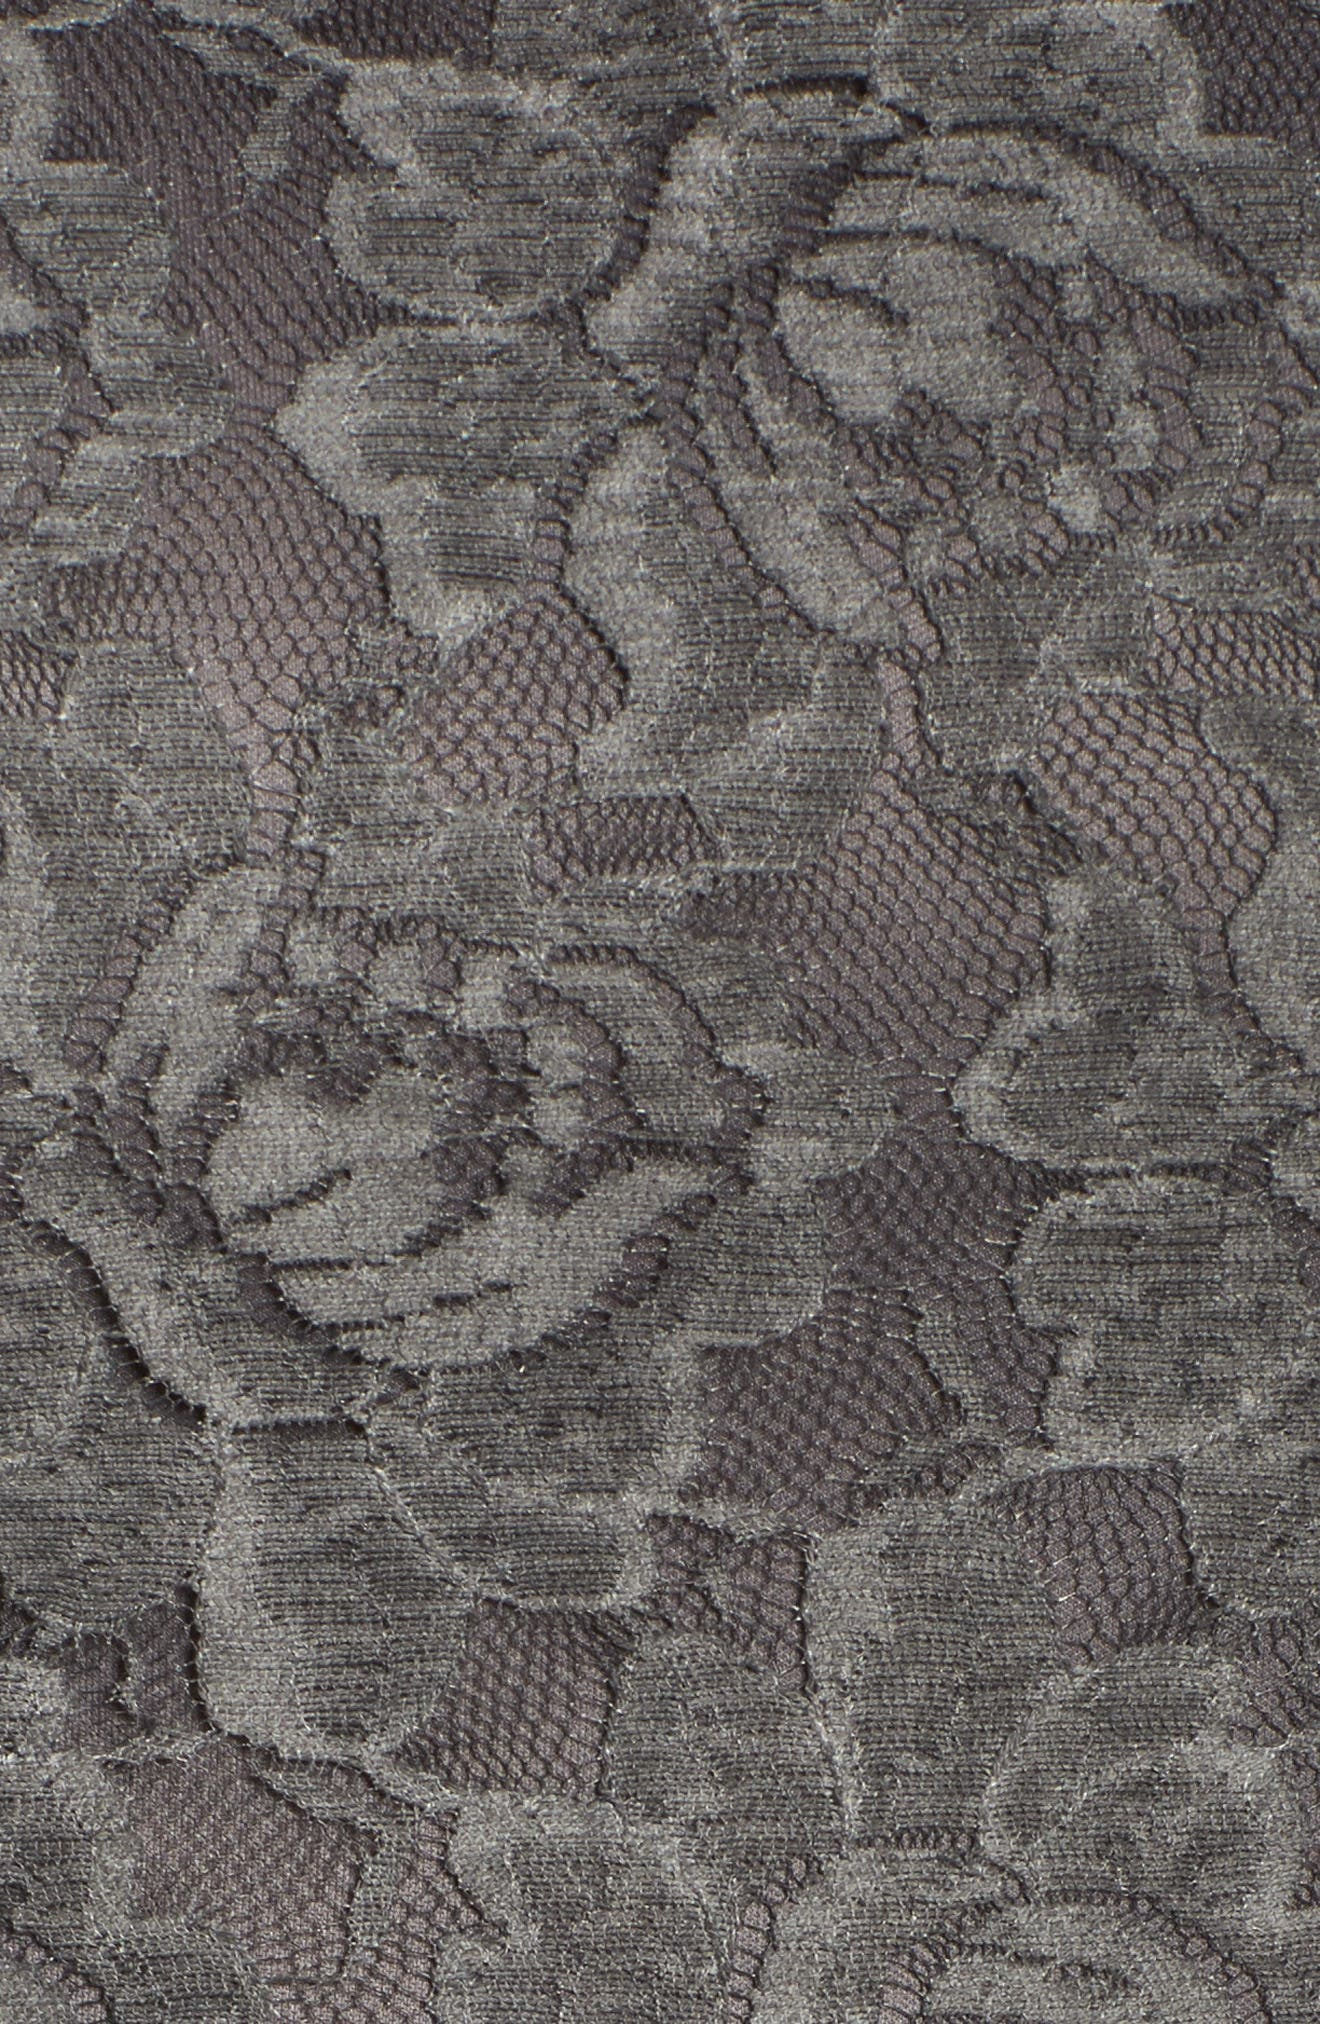 Lace Skater Dress,                             Alternate thumbnail 5, color,                             Charcoal